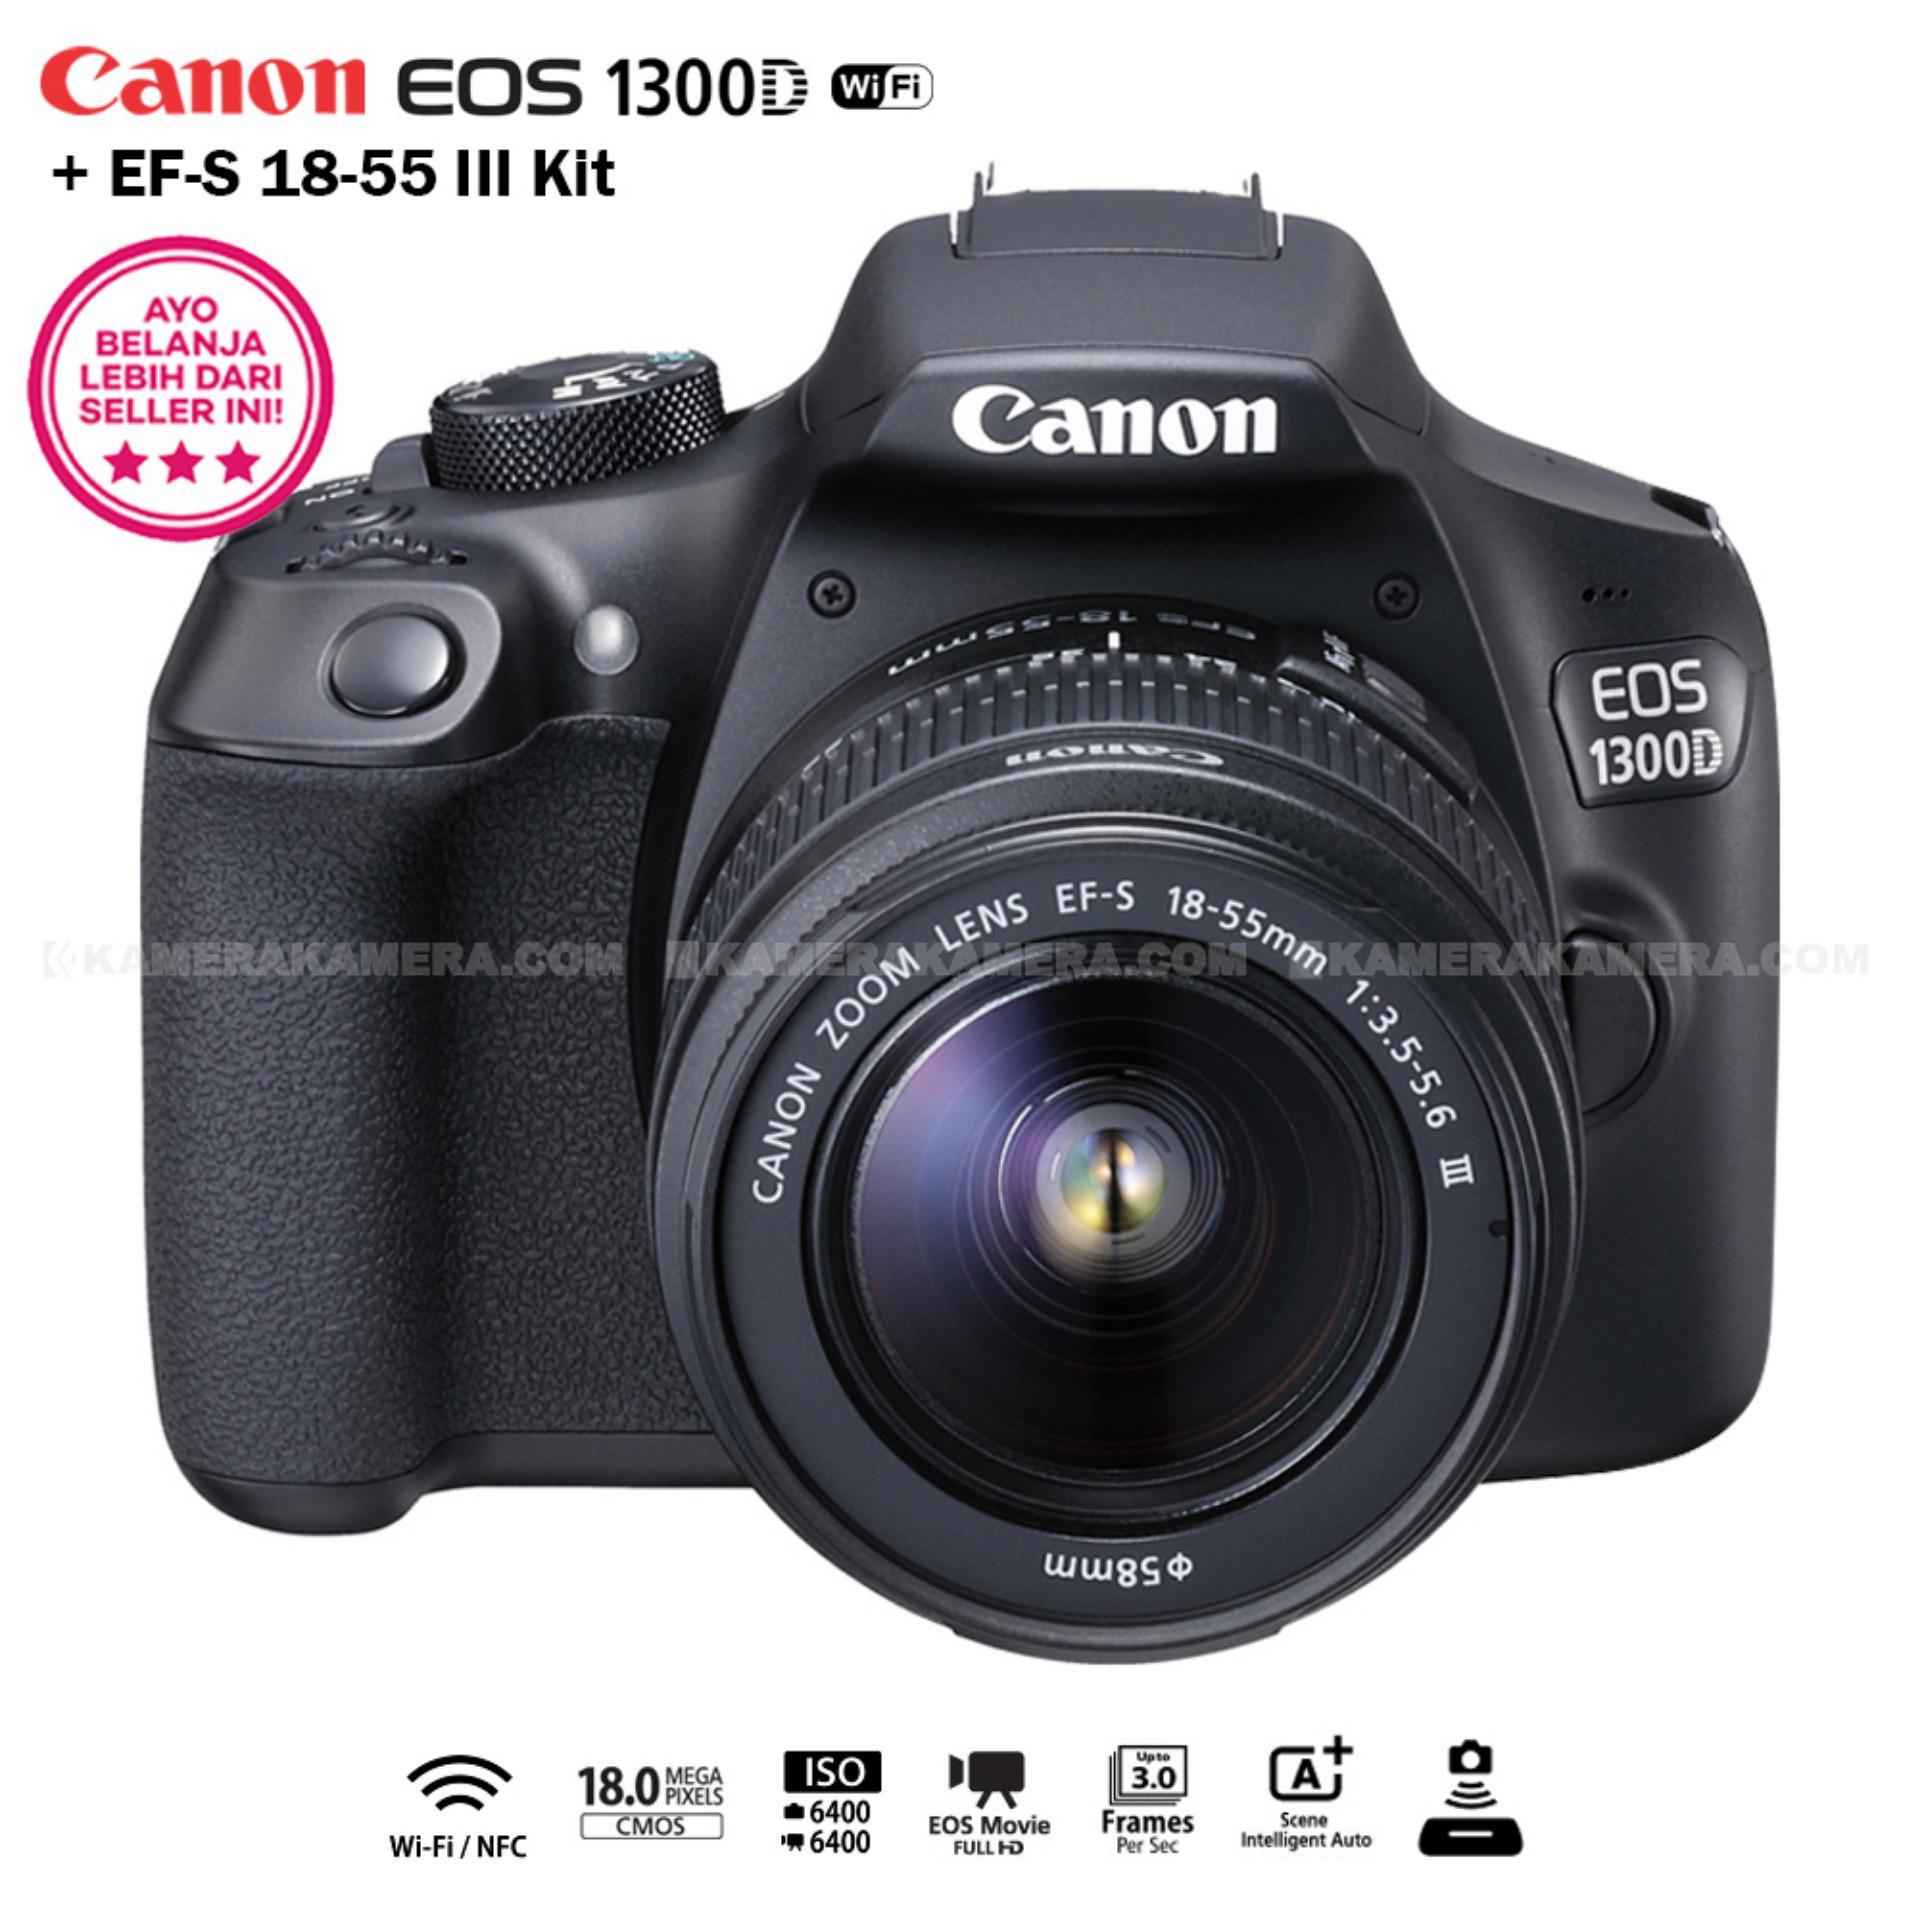 Kamera digital canon terbaik lazada canon eos 1300d 18mp wi finfc ef s 18 thecheapjerseys Choice Image